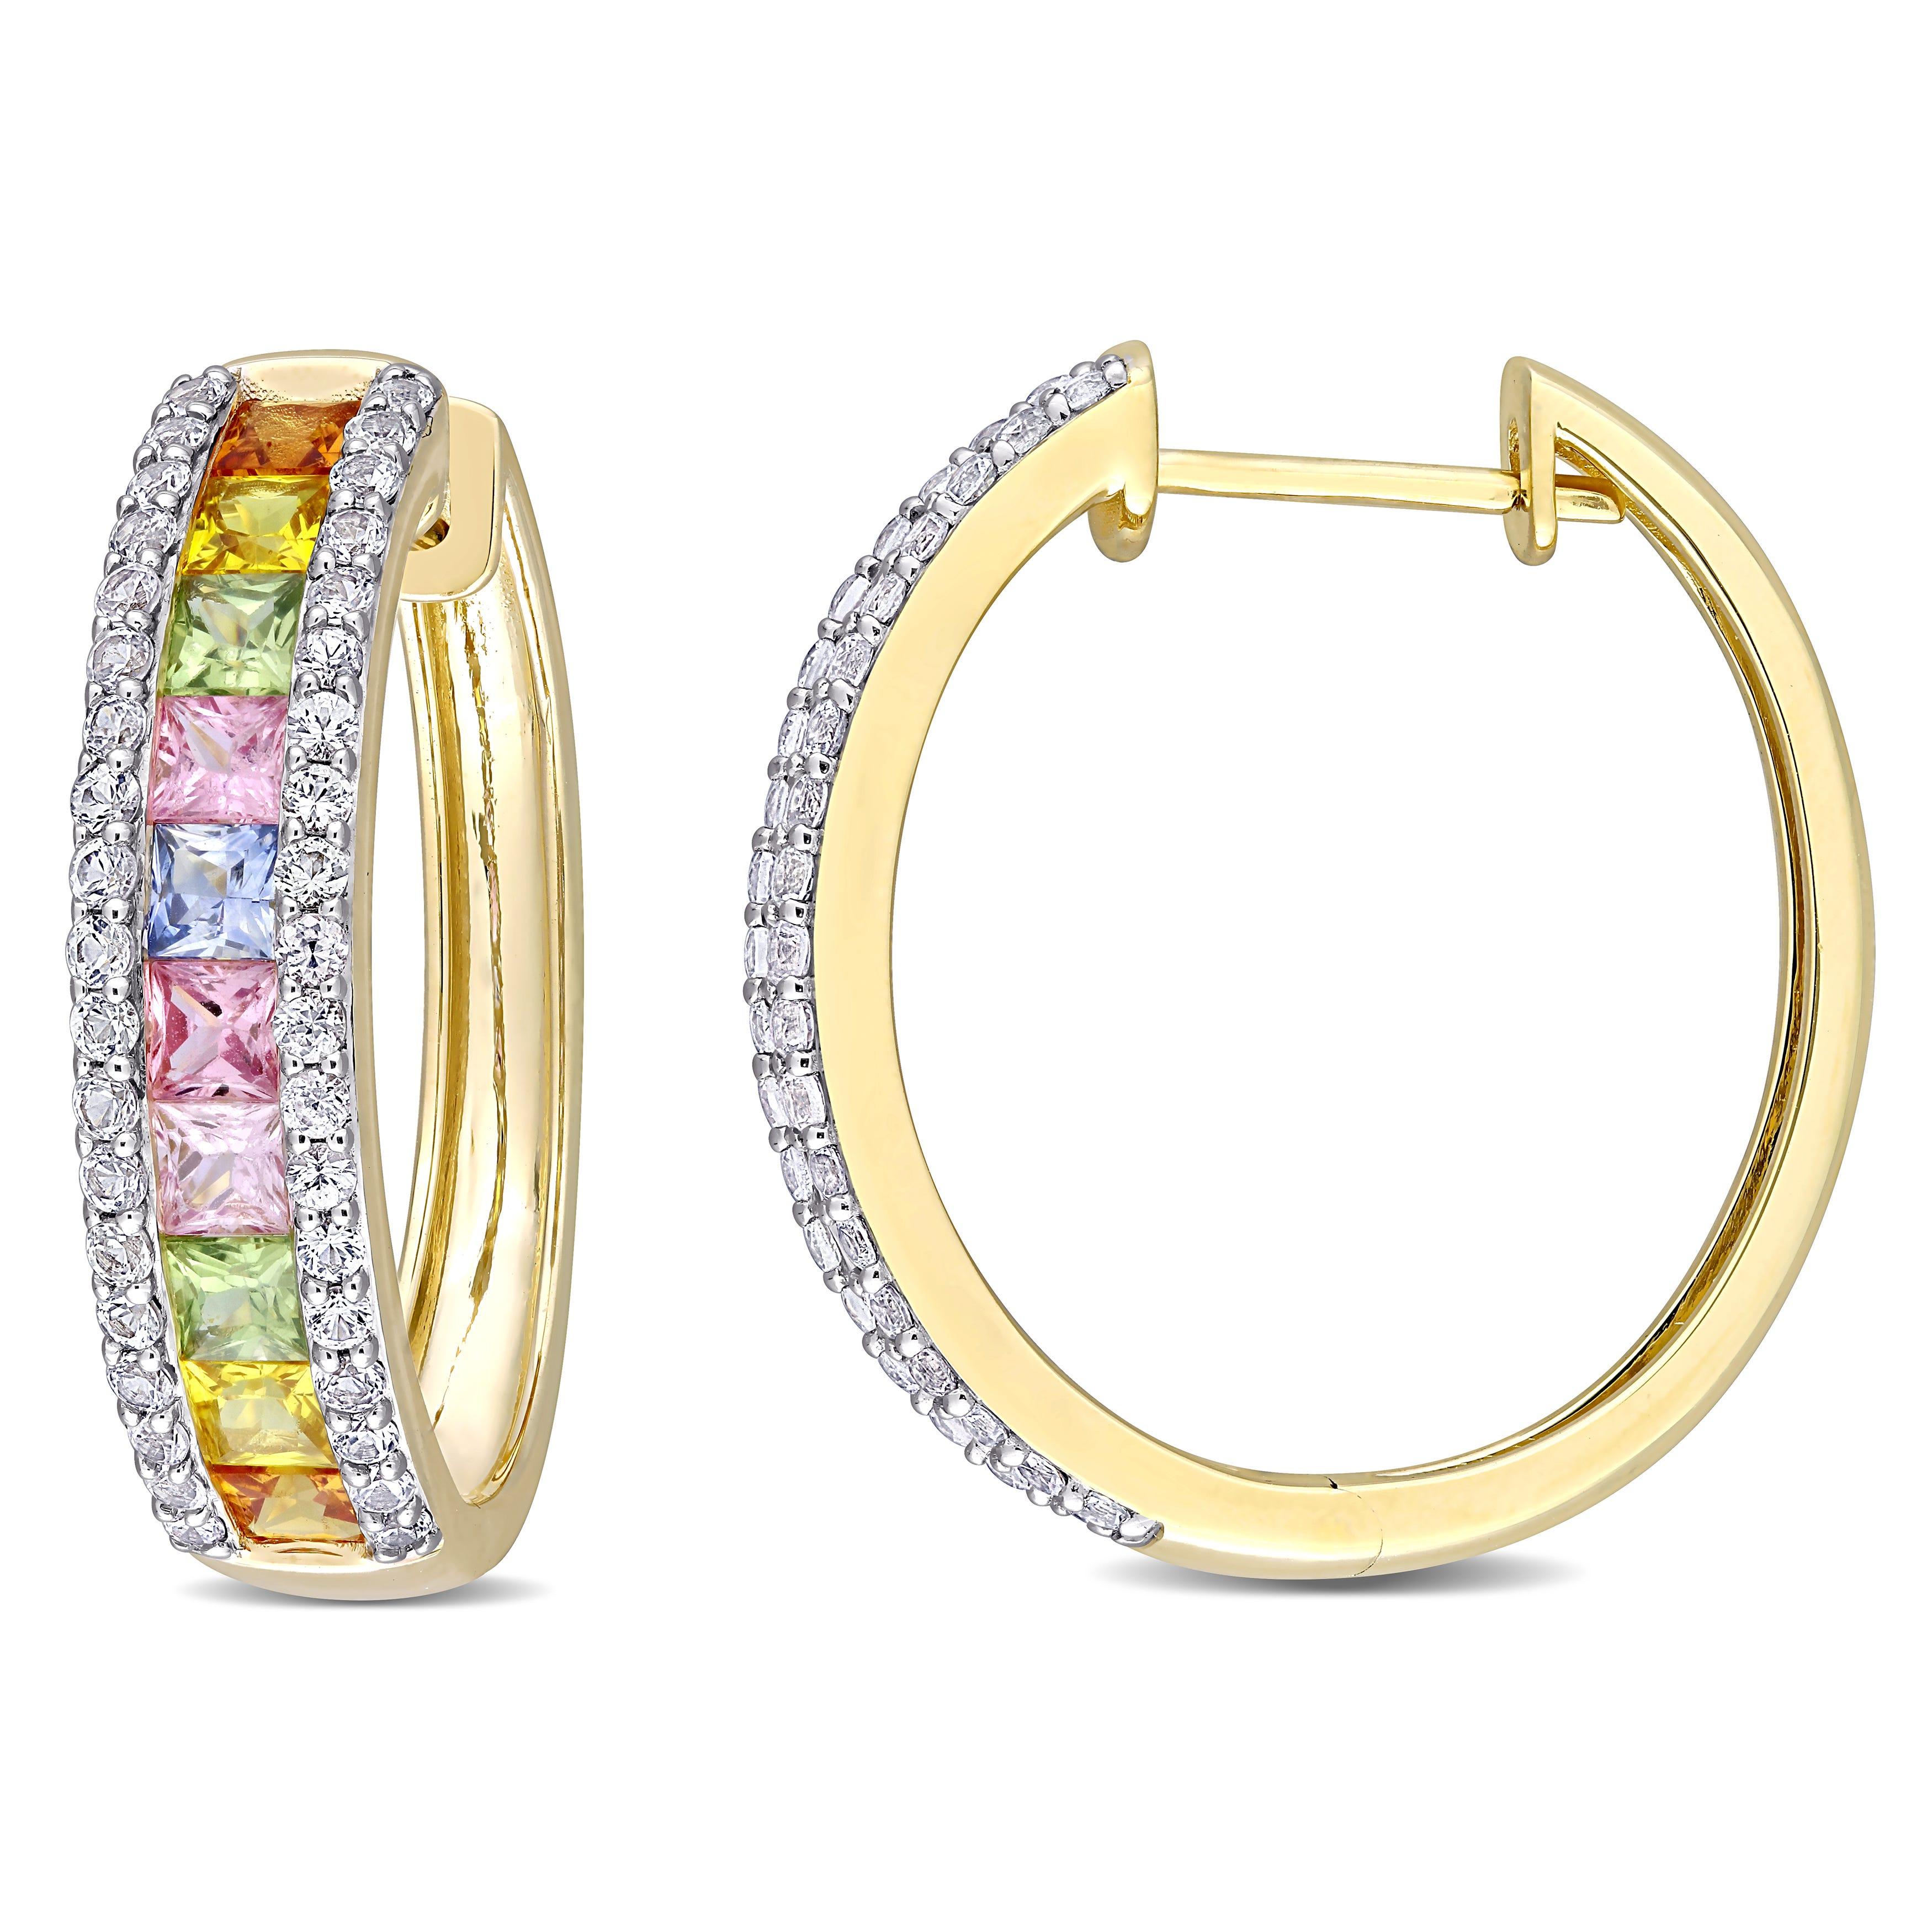 Rainbow Created Sapphire Hoop Earrings in 14k Yellow Gold